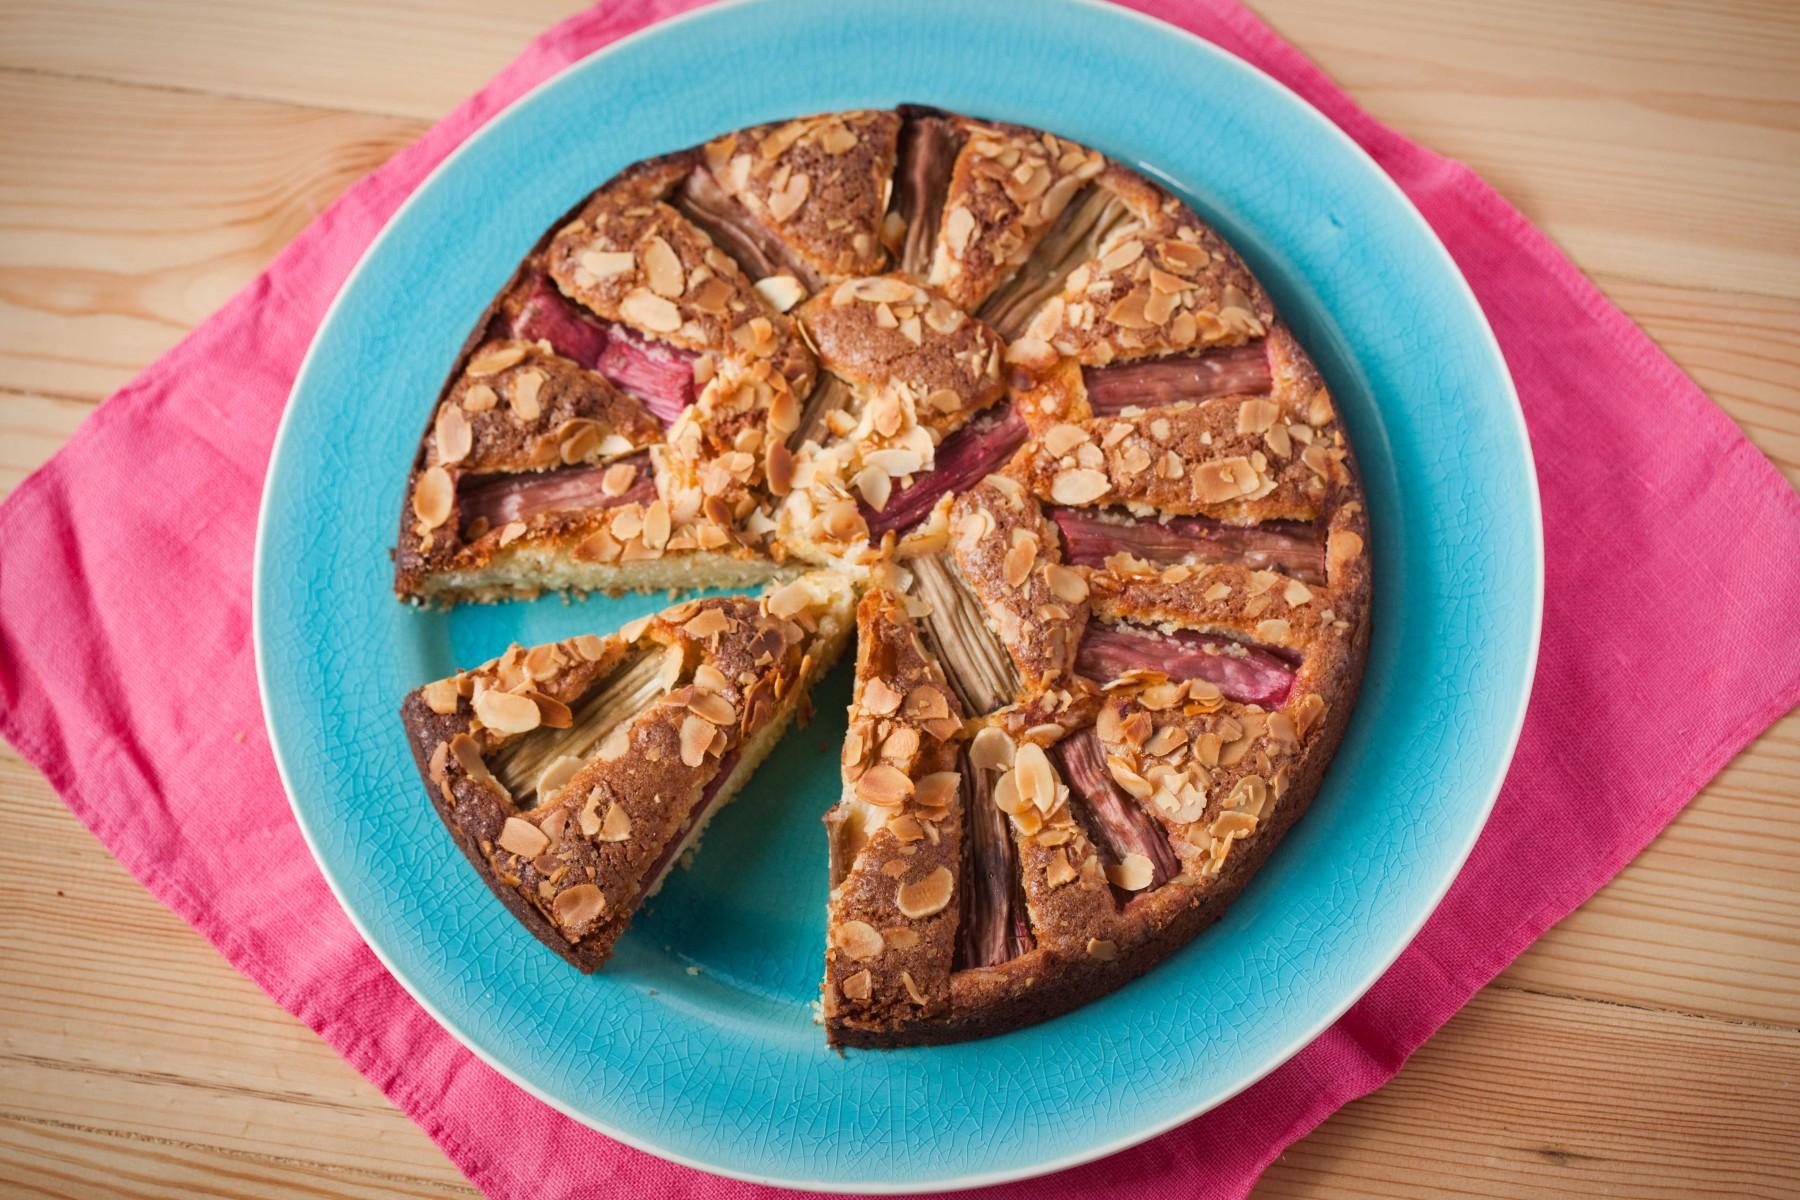 ciasto-z-rabarbarem-i-migdalam